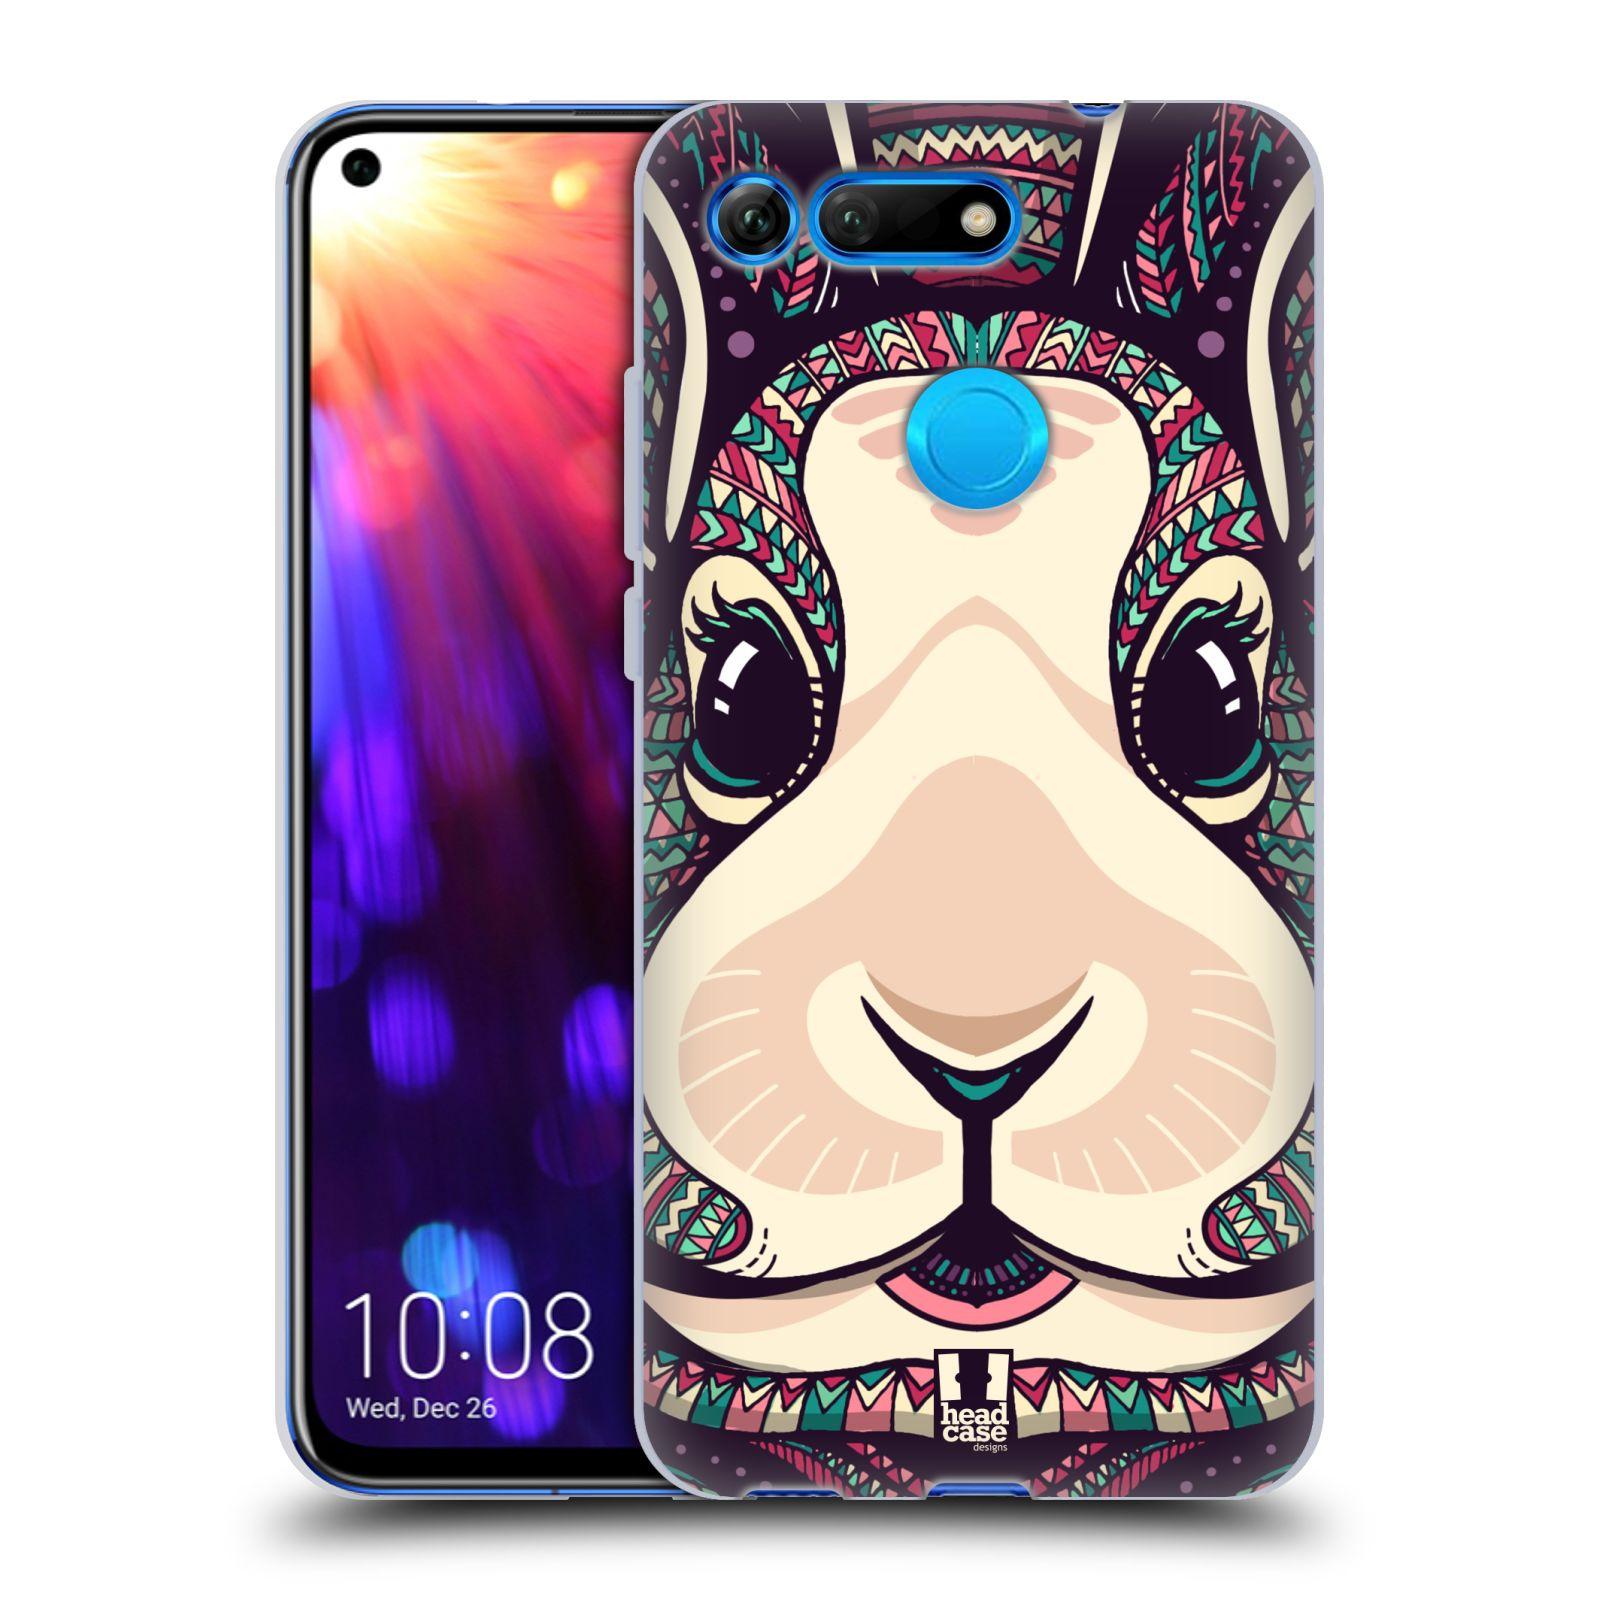 Silikonové pouzdro na mobil Honor View 20 - Head Case - AZTEC ZAJÍČEK